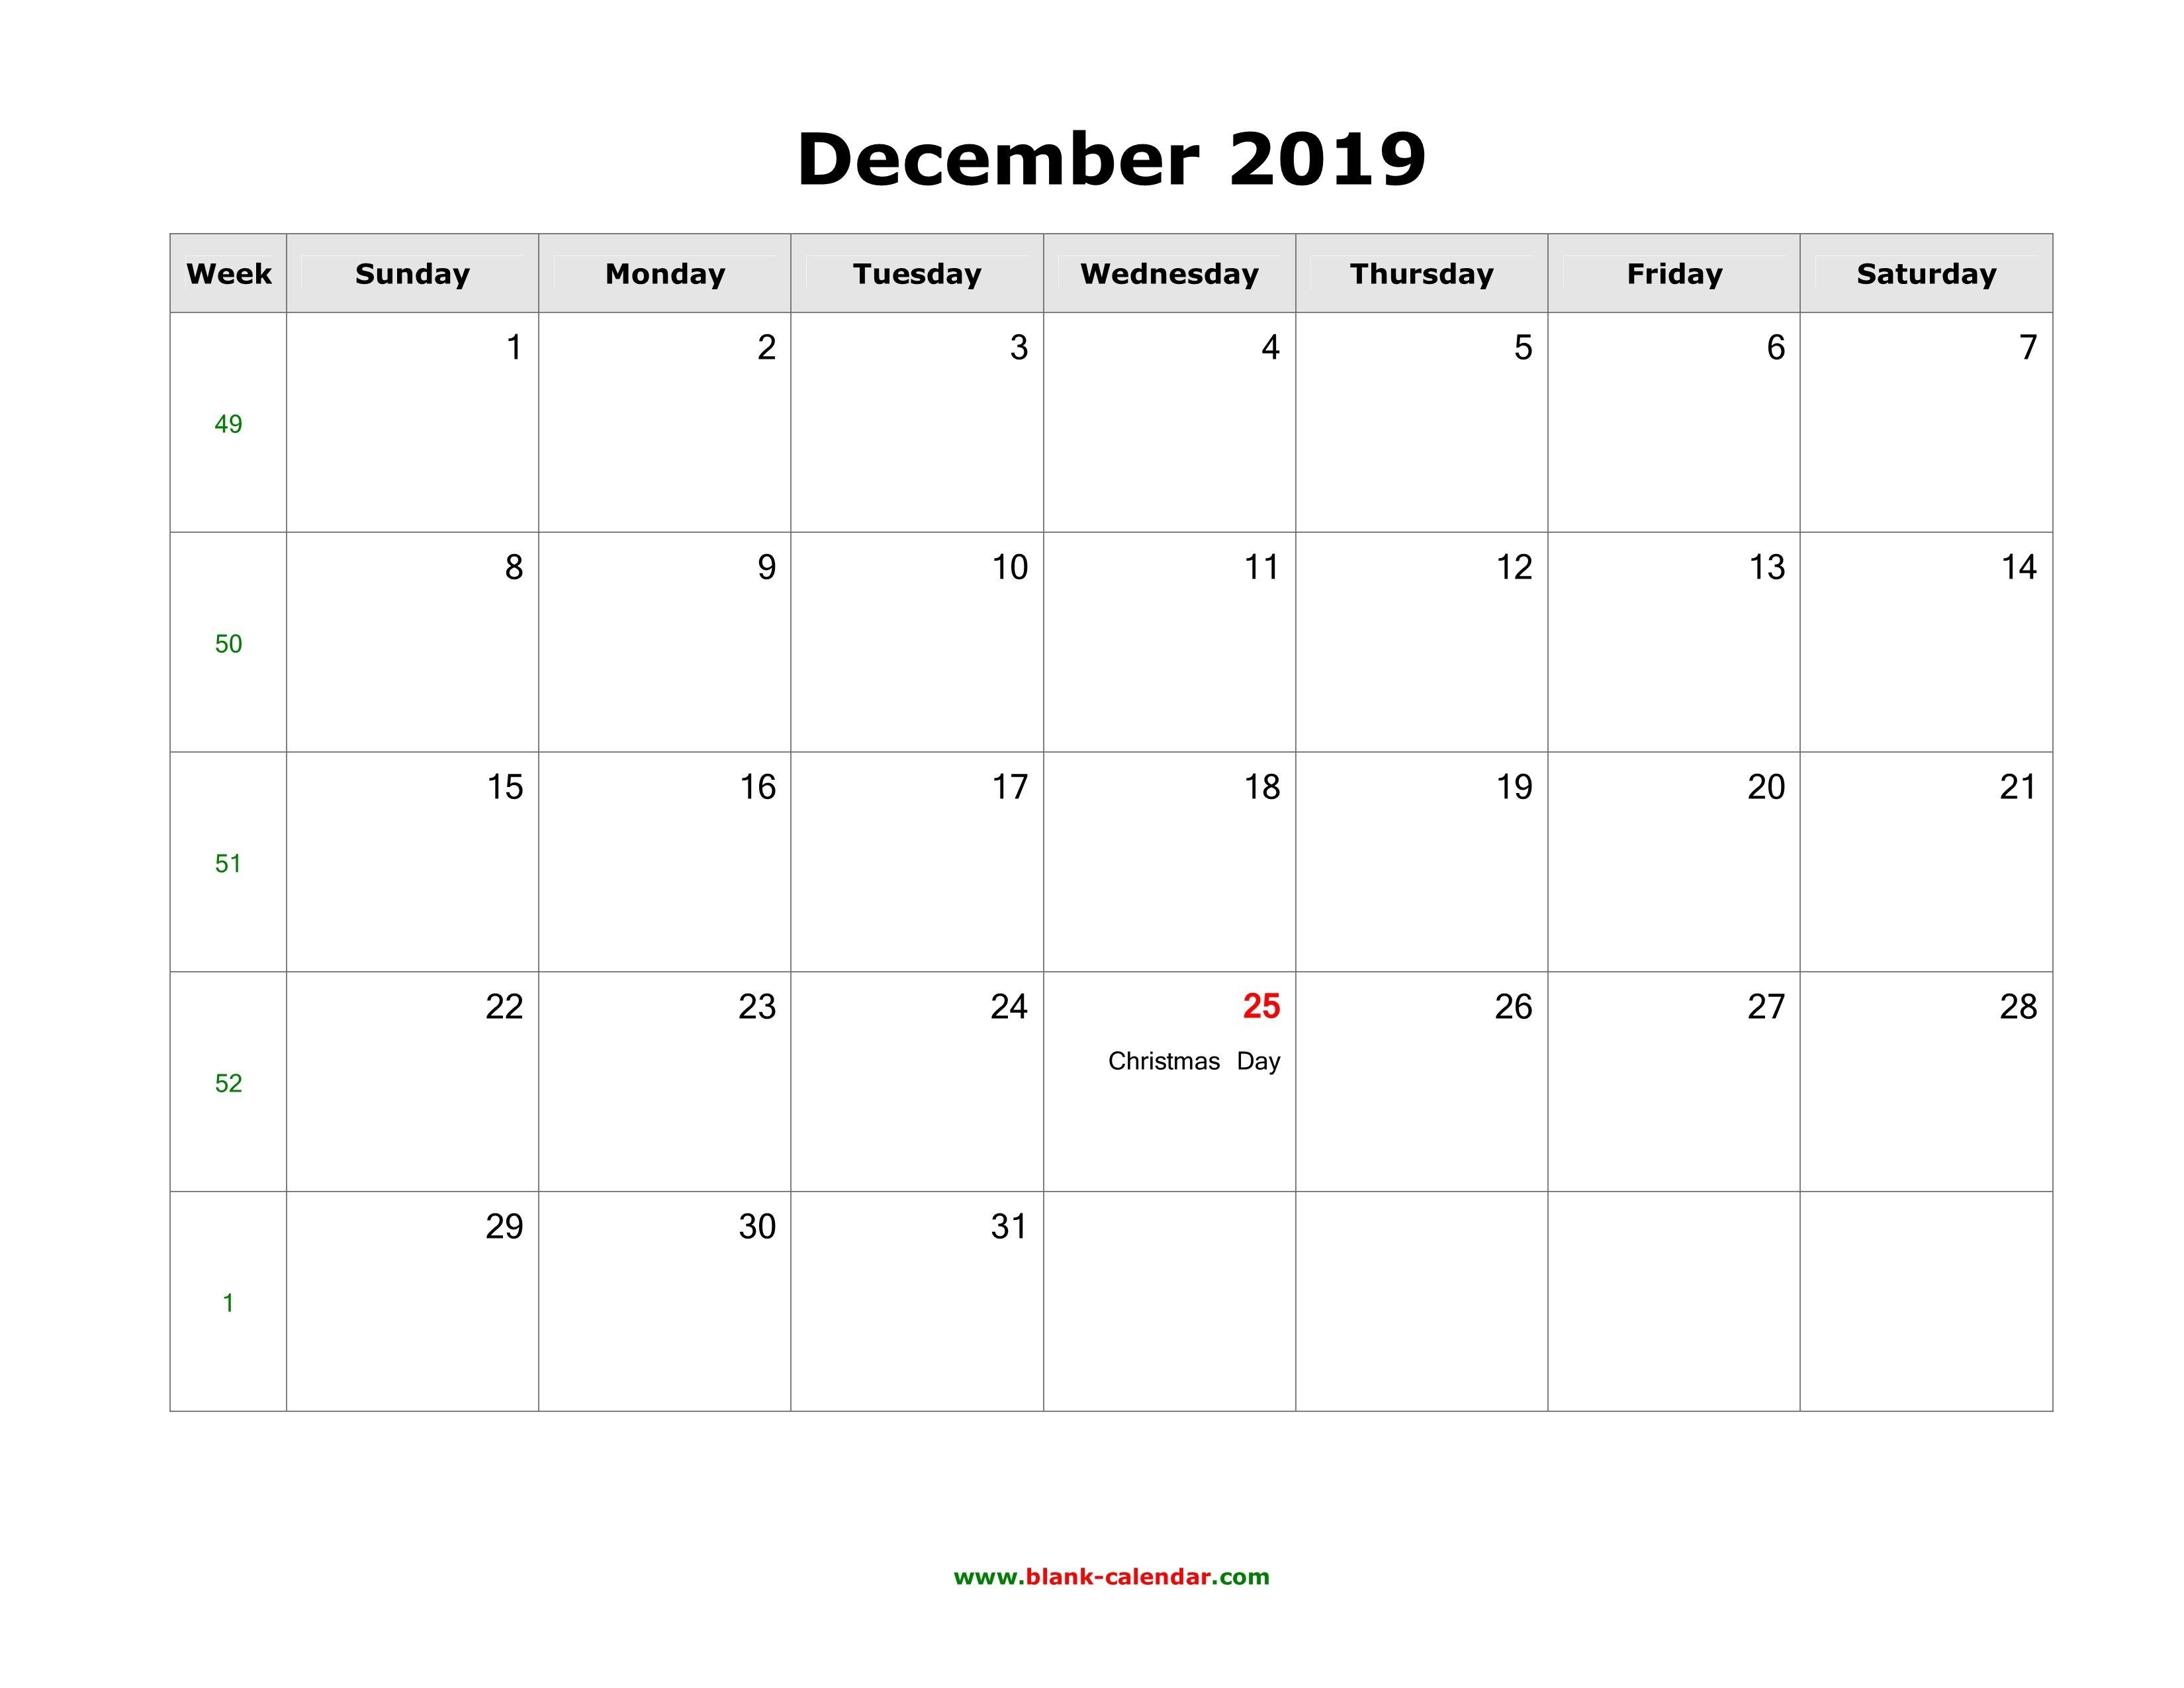 Download December 2019 Blank Calendar With Us Holidays (Horizontal) Calendar 2019 December